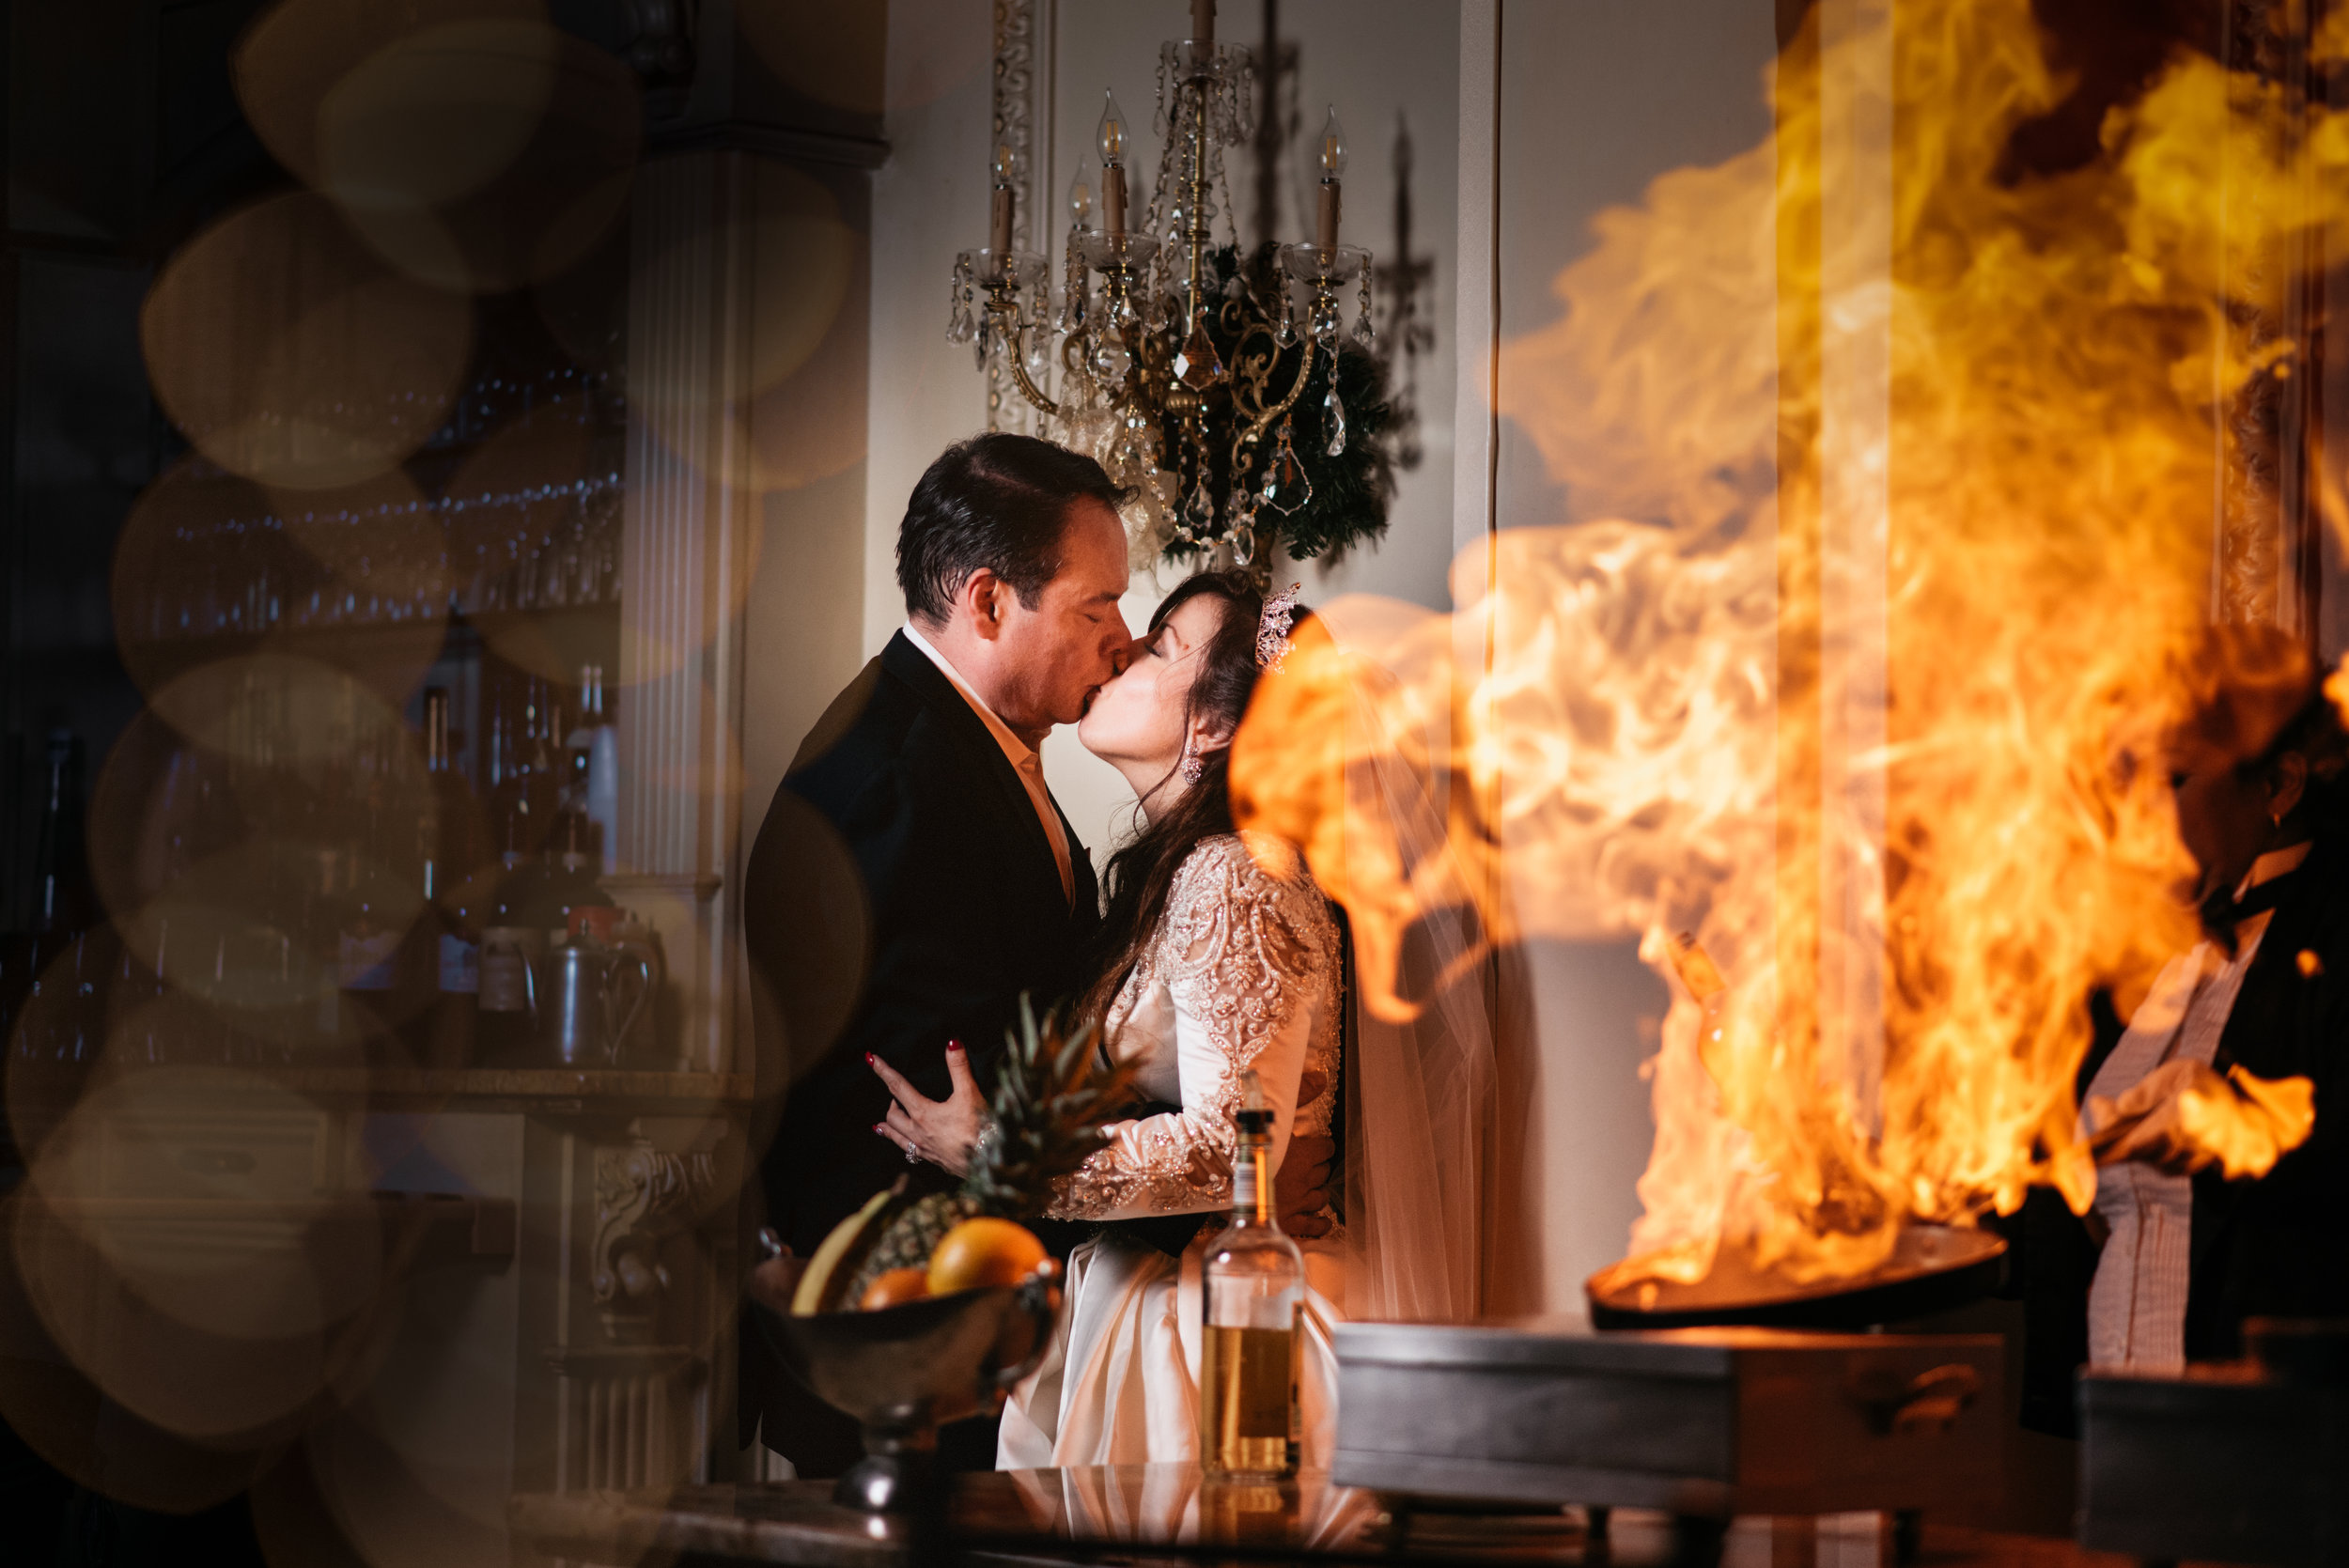 WeddingPhotos | NJPhotographer | Highlights-16-11.jpg